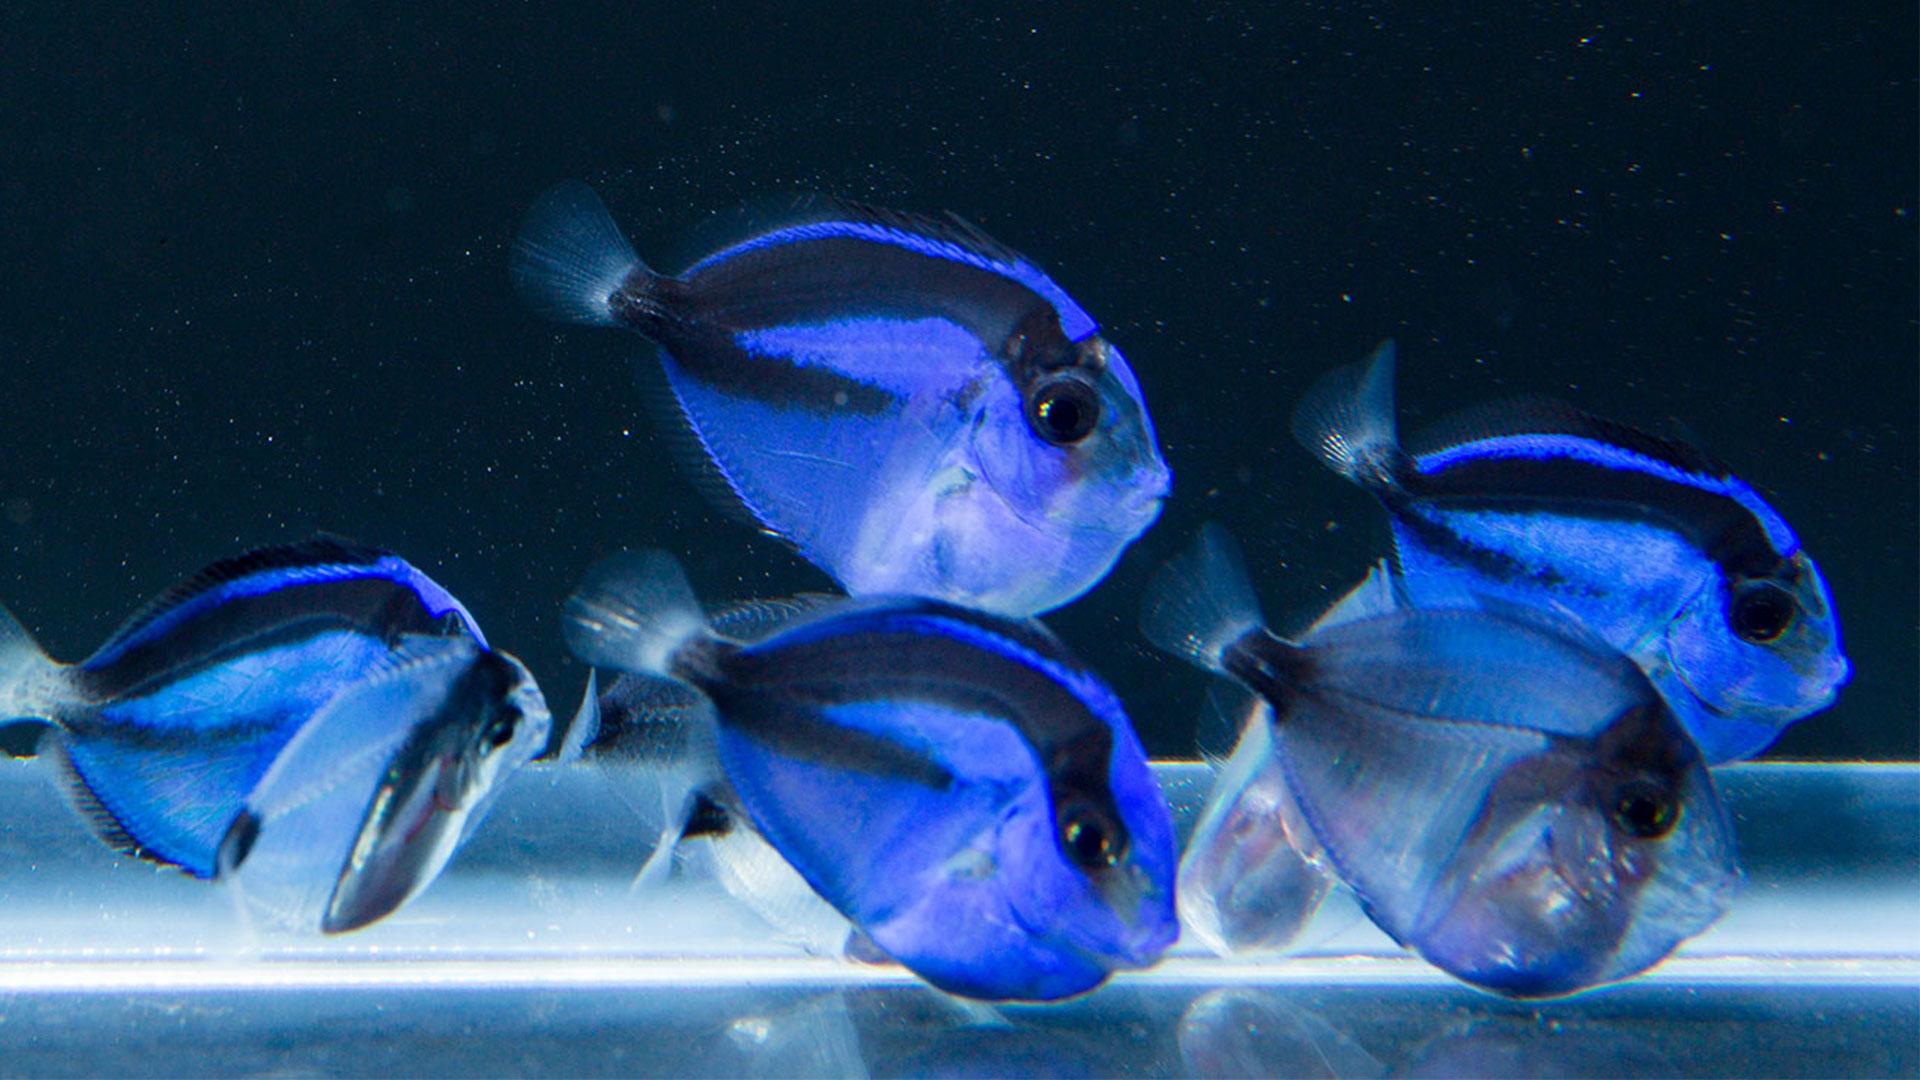 bluetangfry1